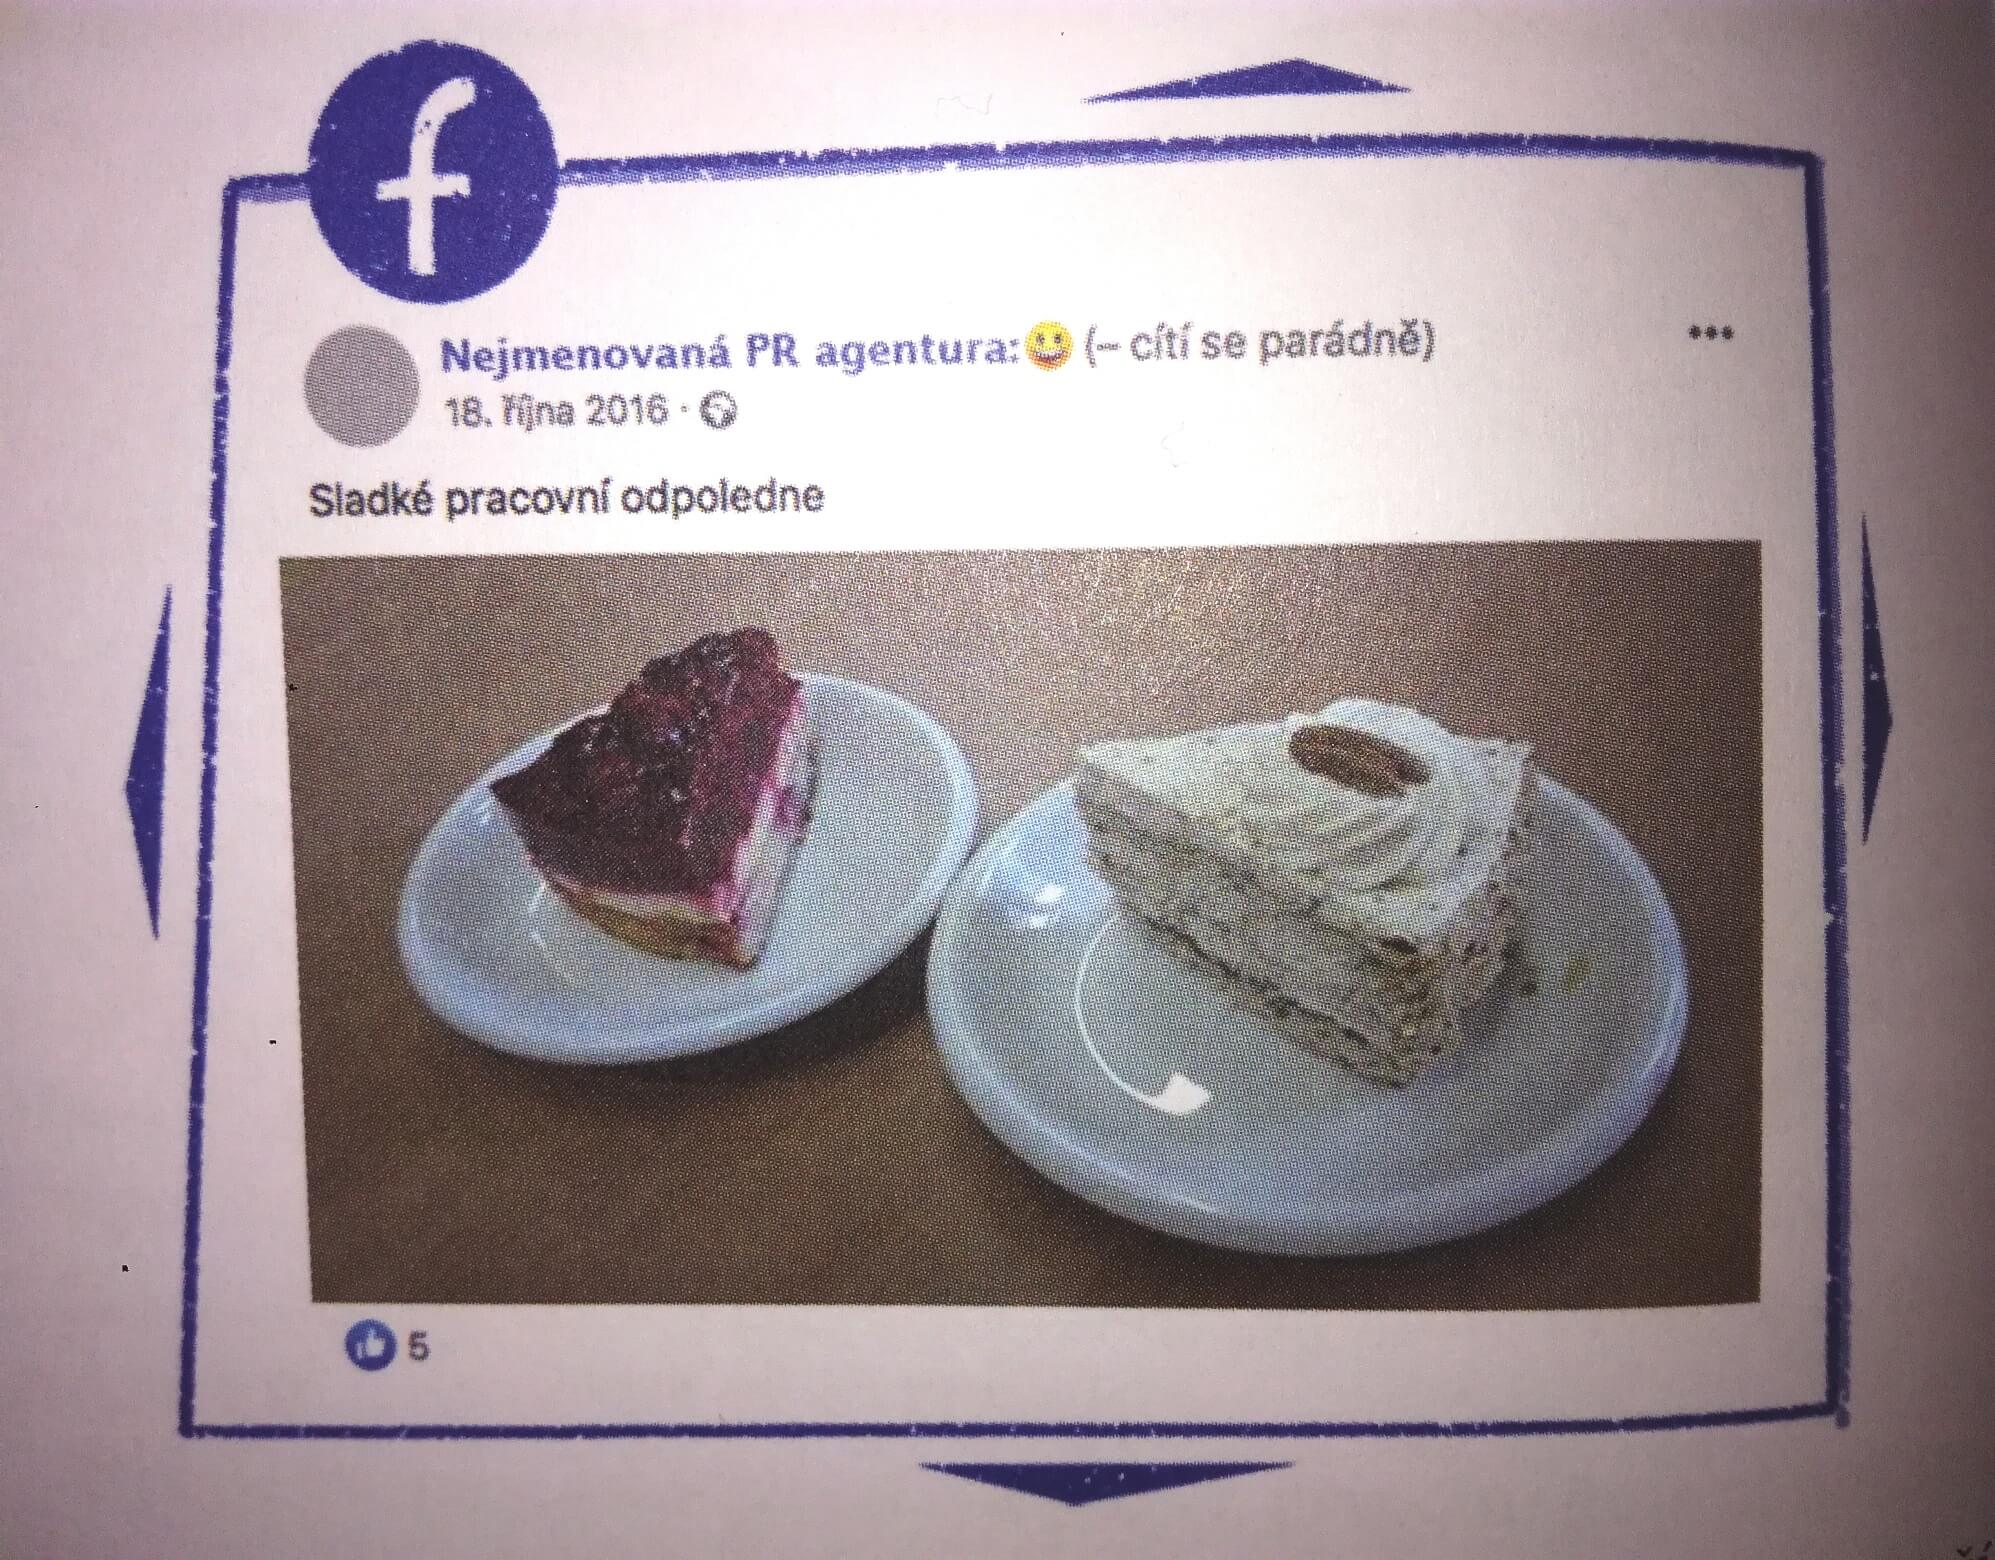 Ukazka-vycpavkovy-post-facebook